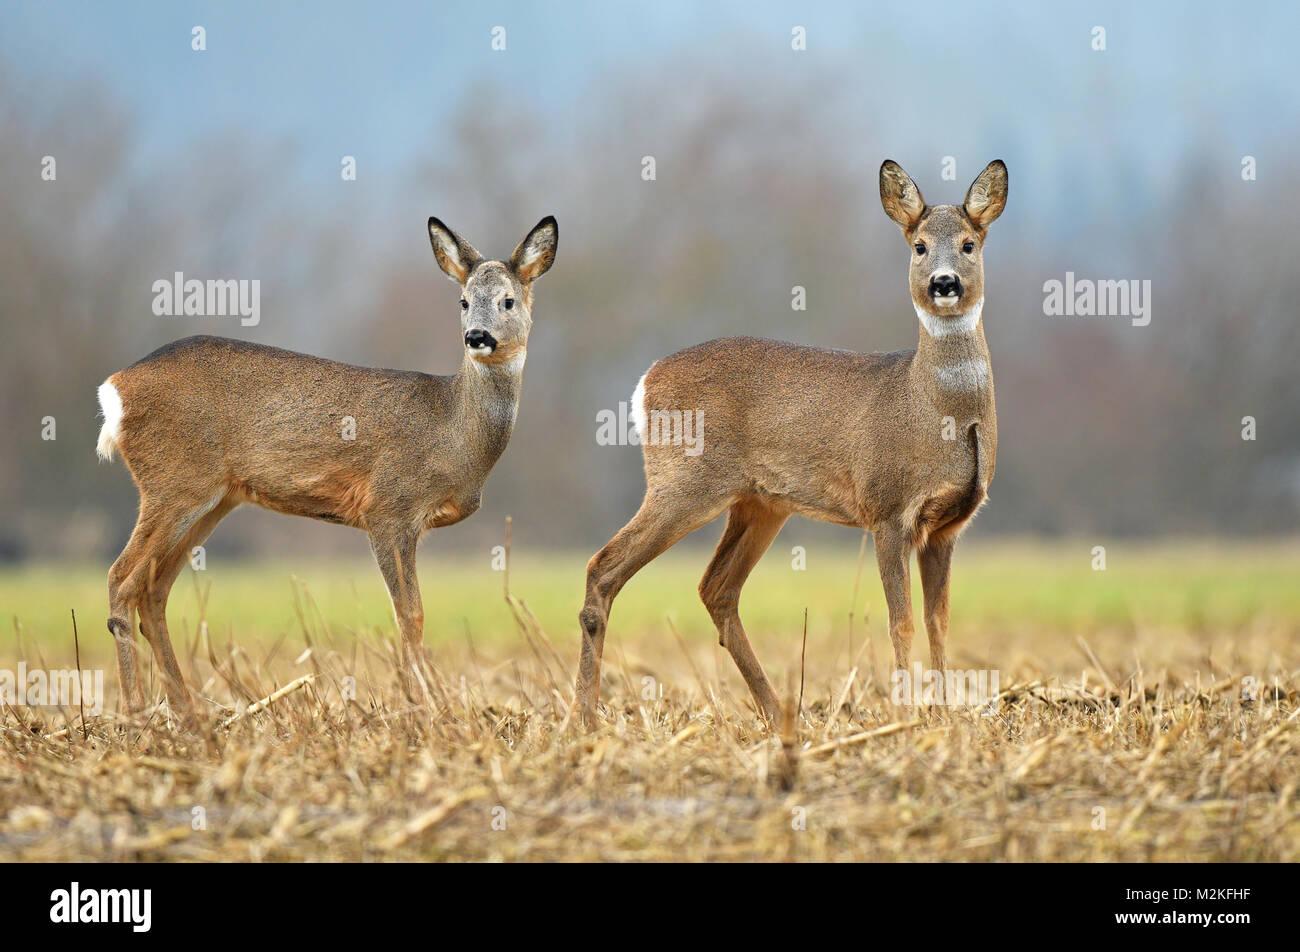 Two wild roe deer s in a field - Stock Image